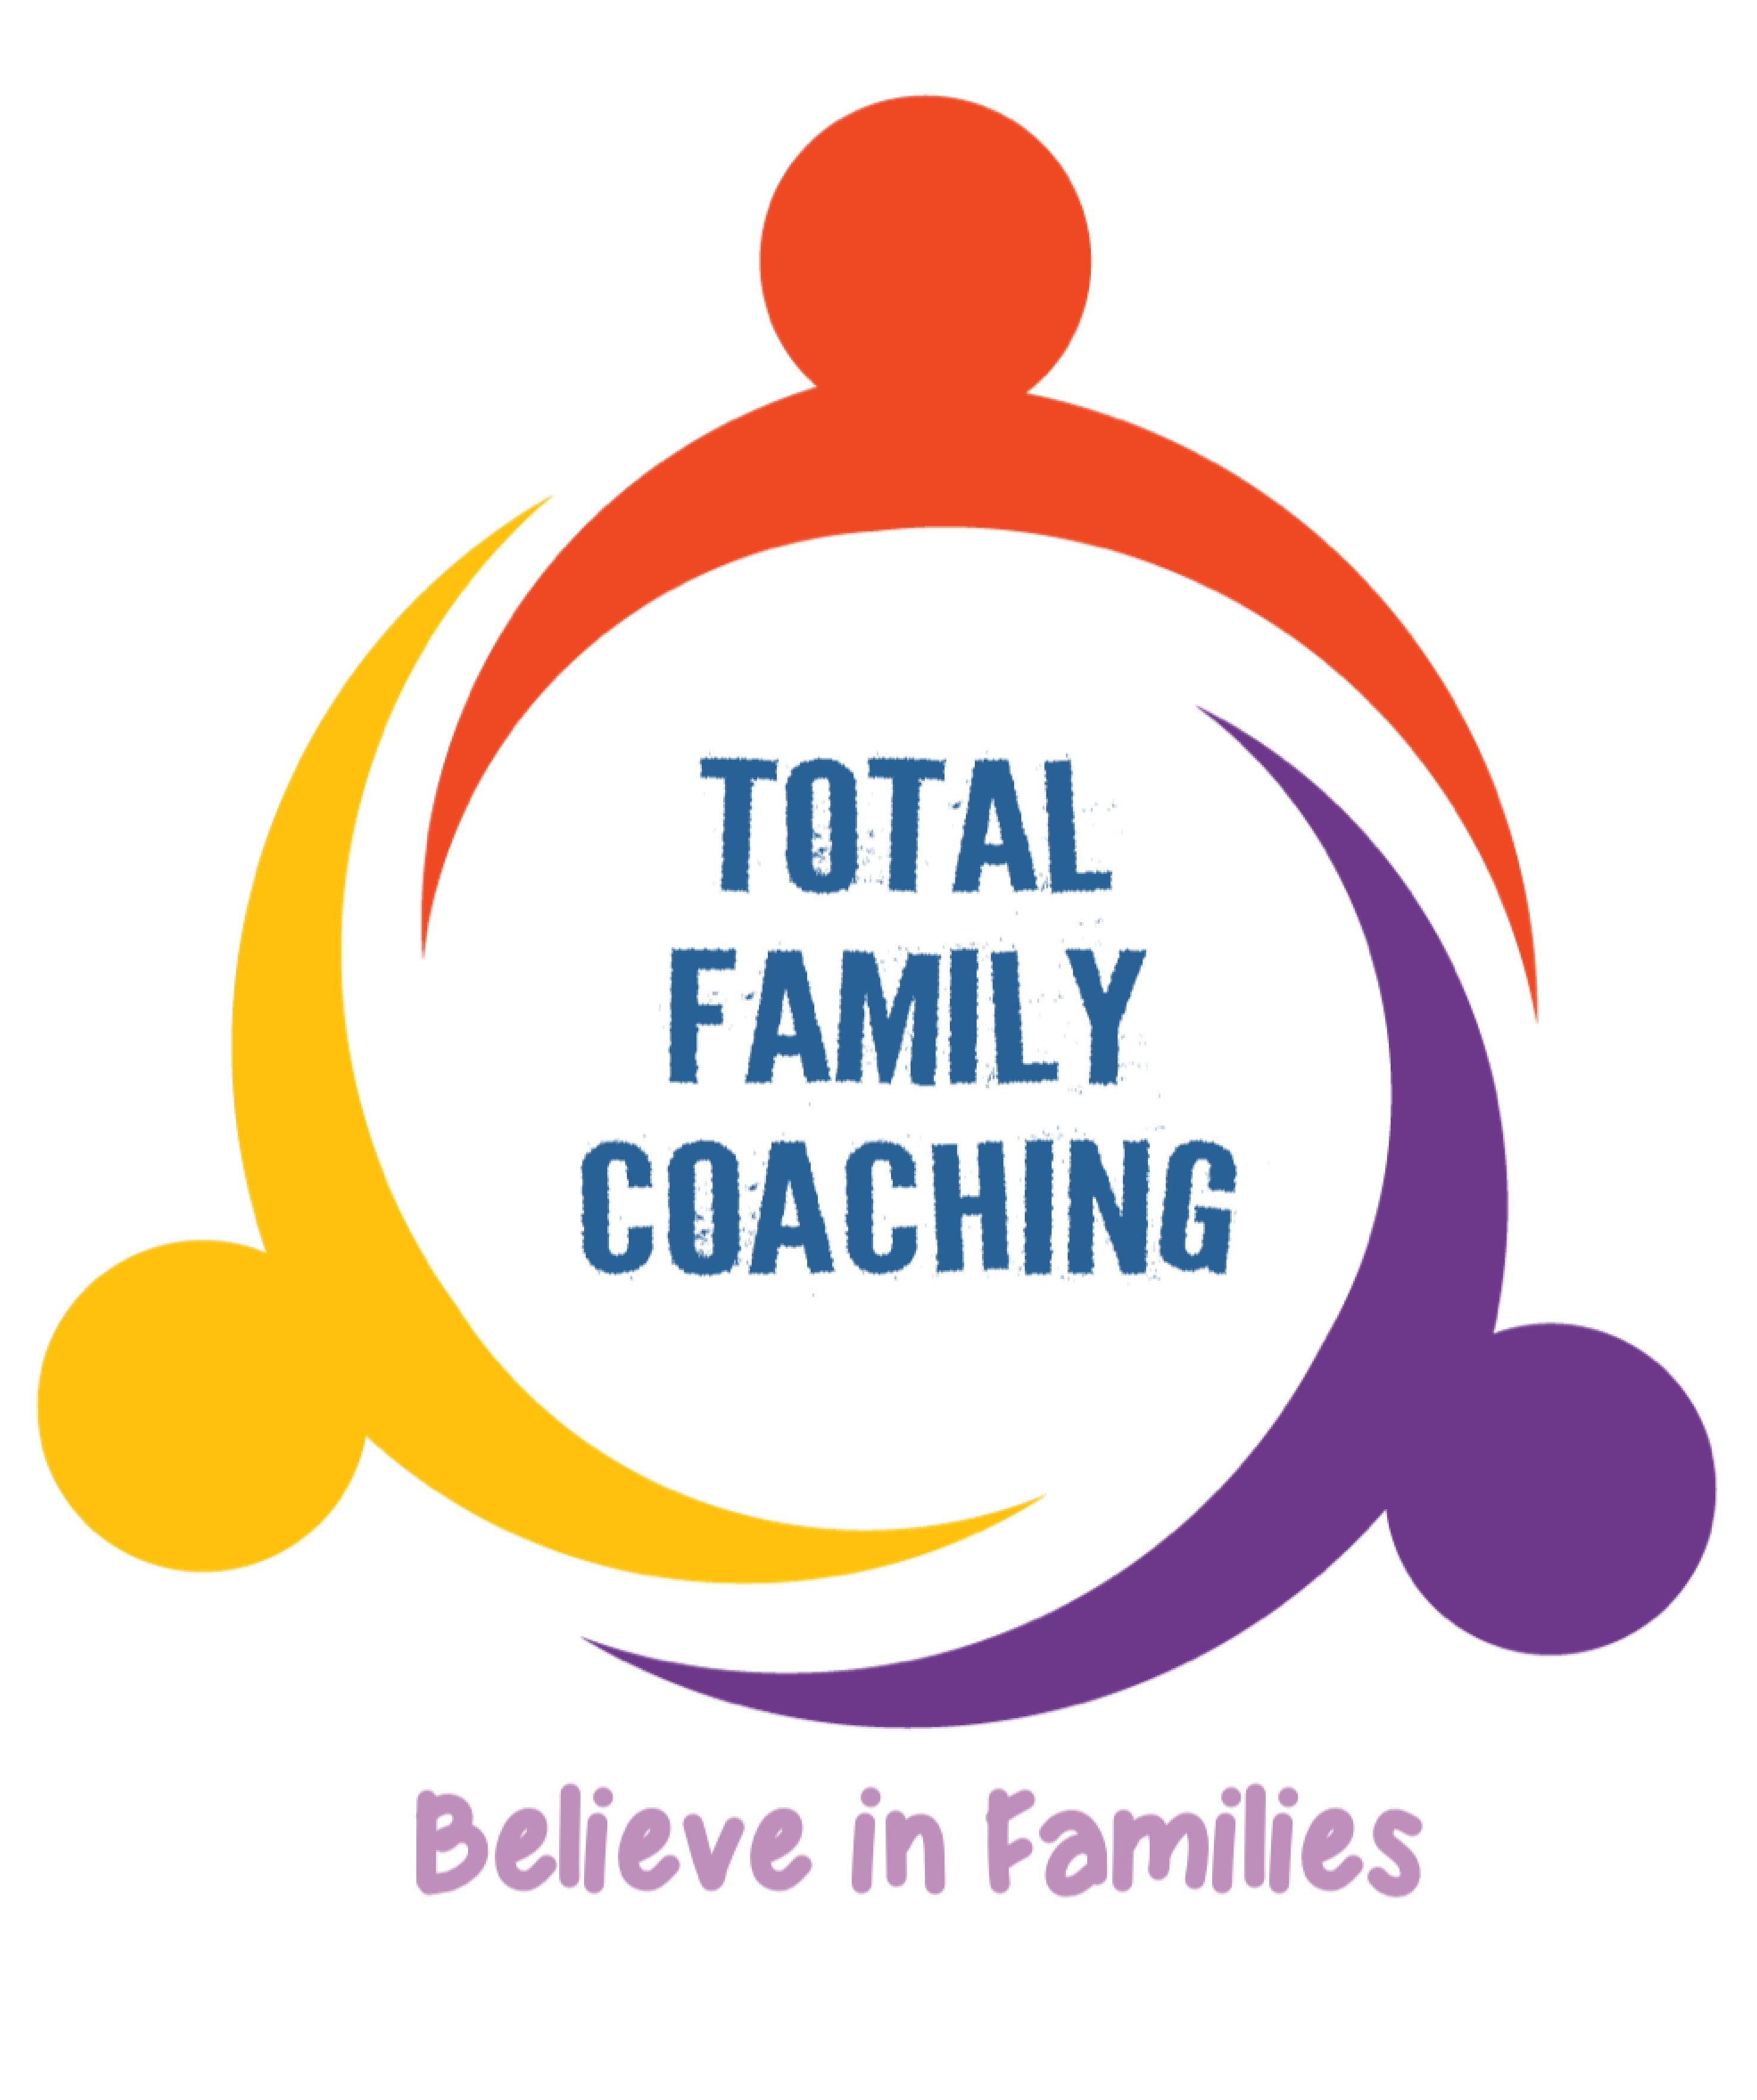 Total Family Coaching